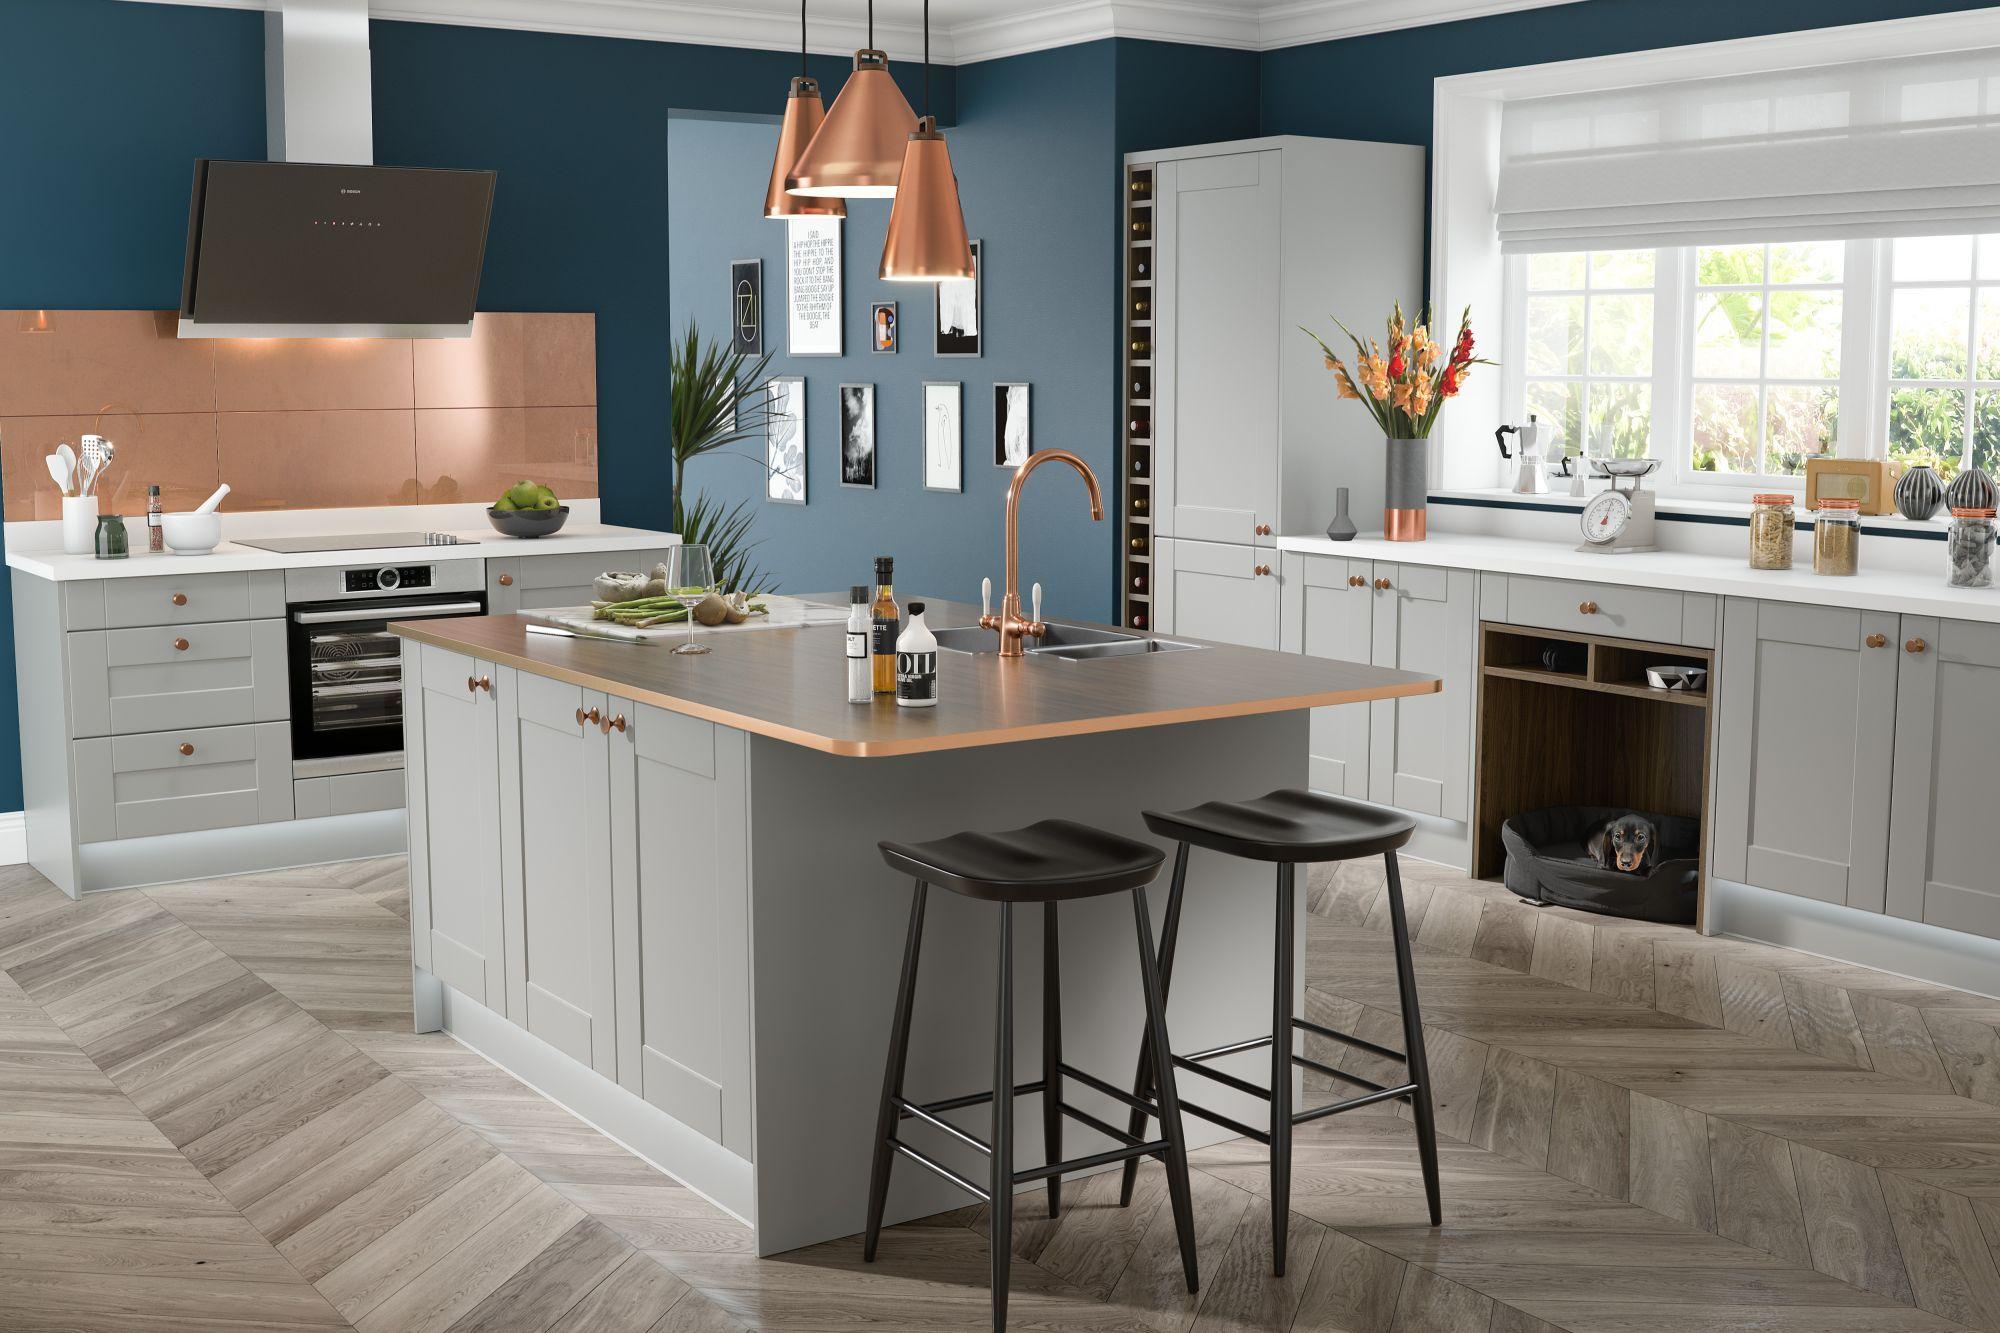 Shaker Kitchen in Fossil Grey Open plan kitchen dining